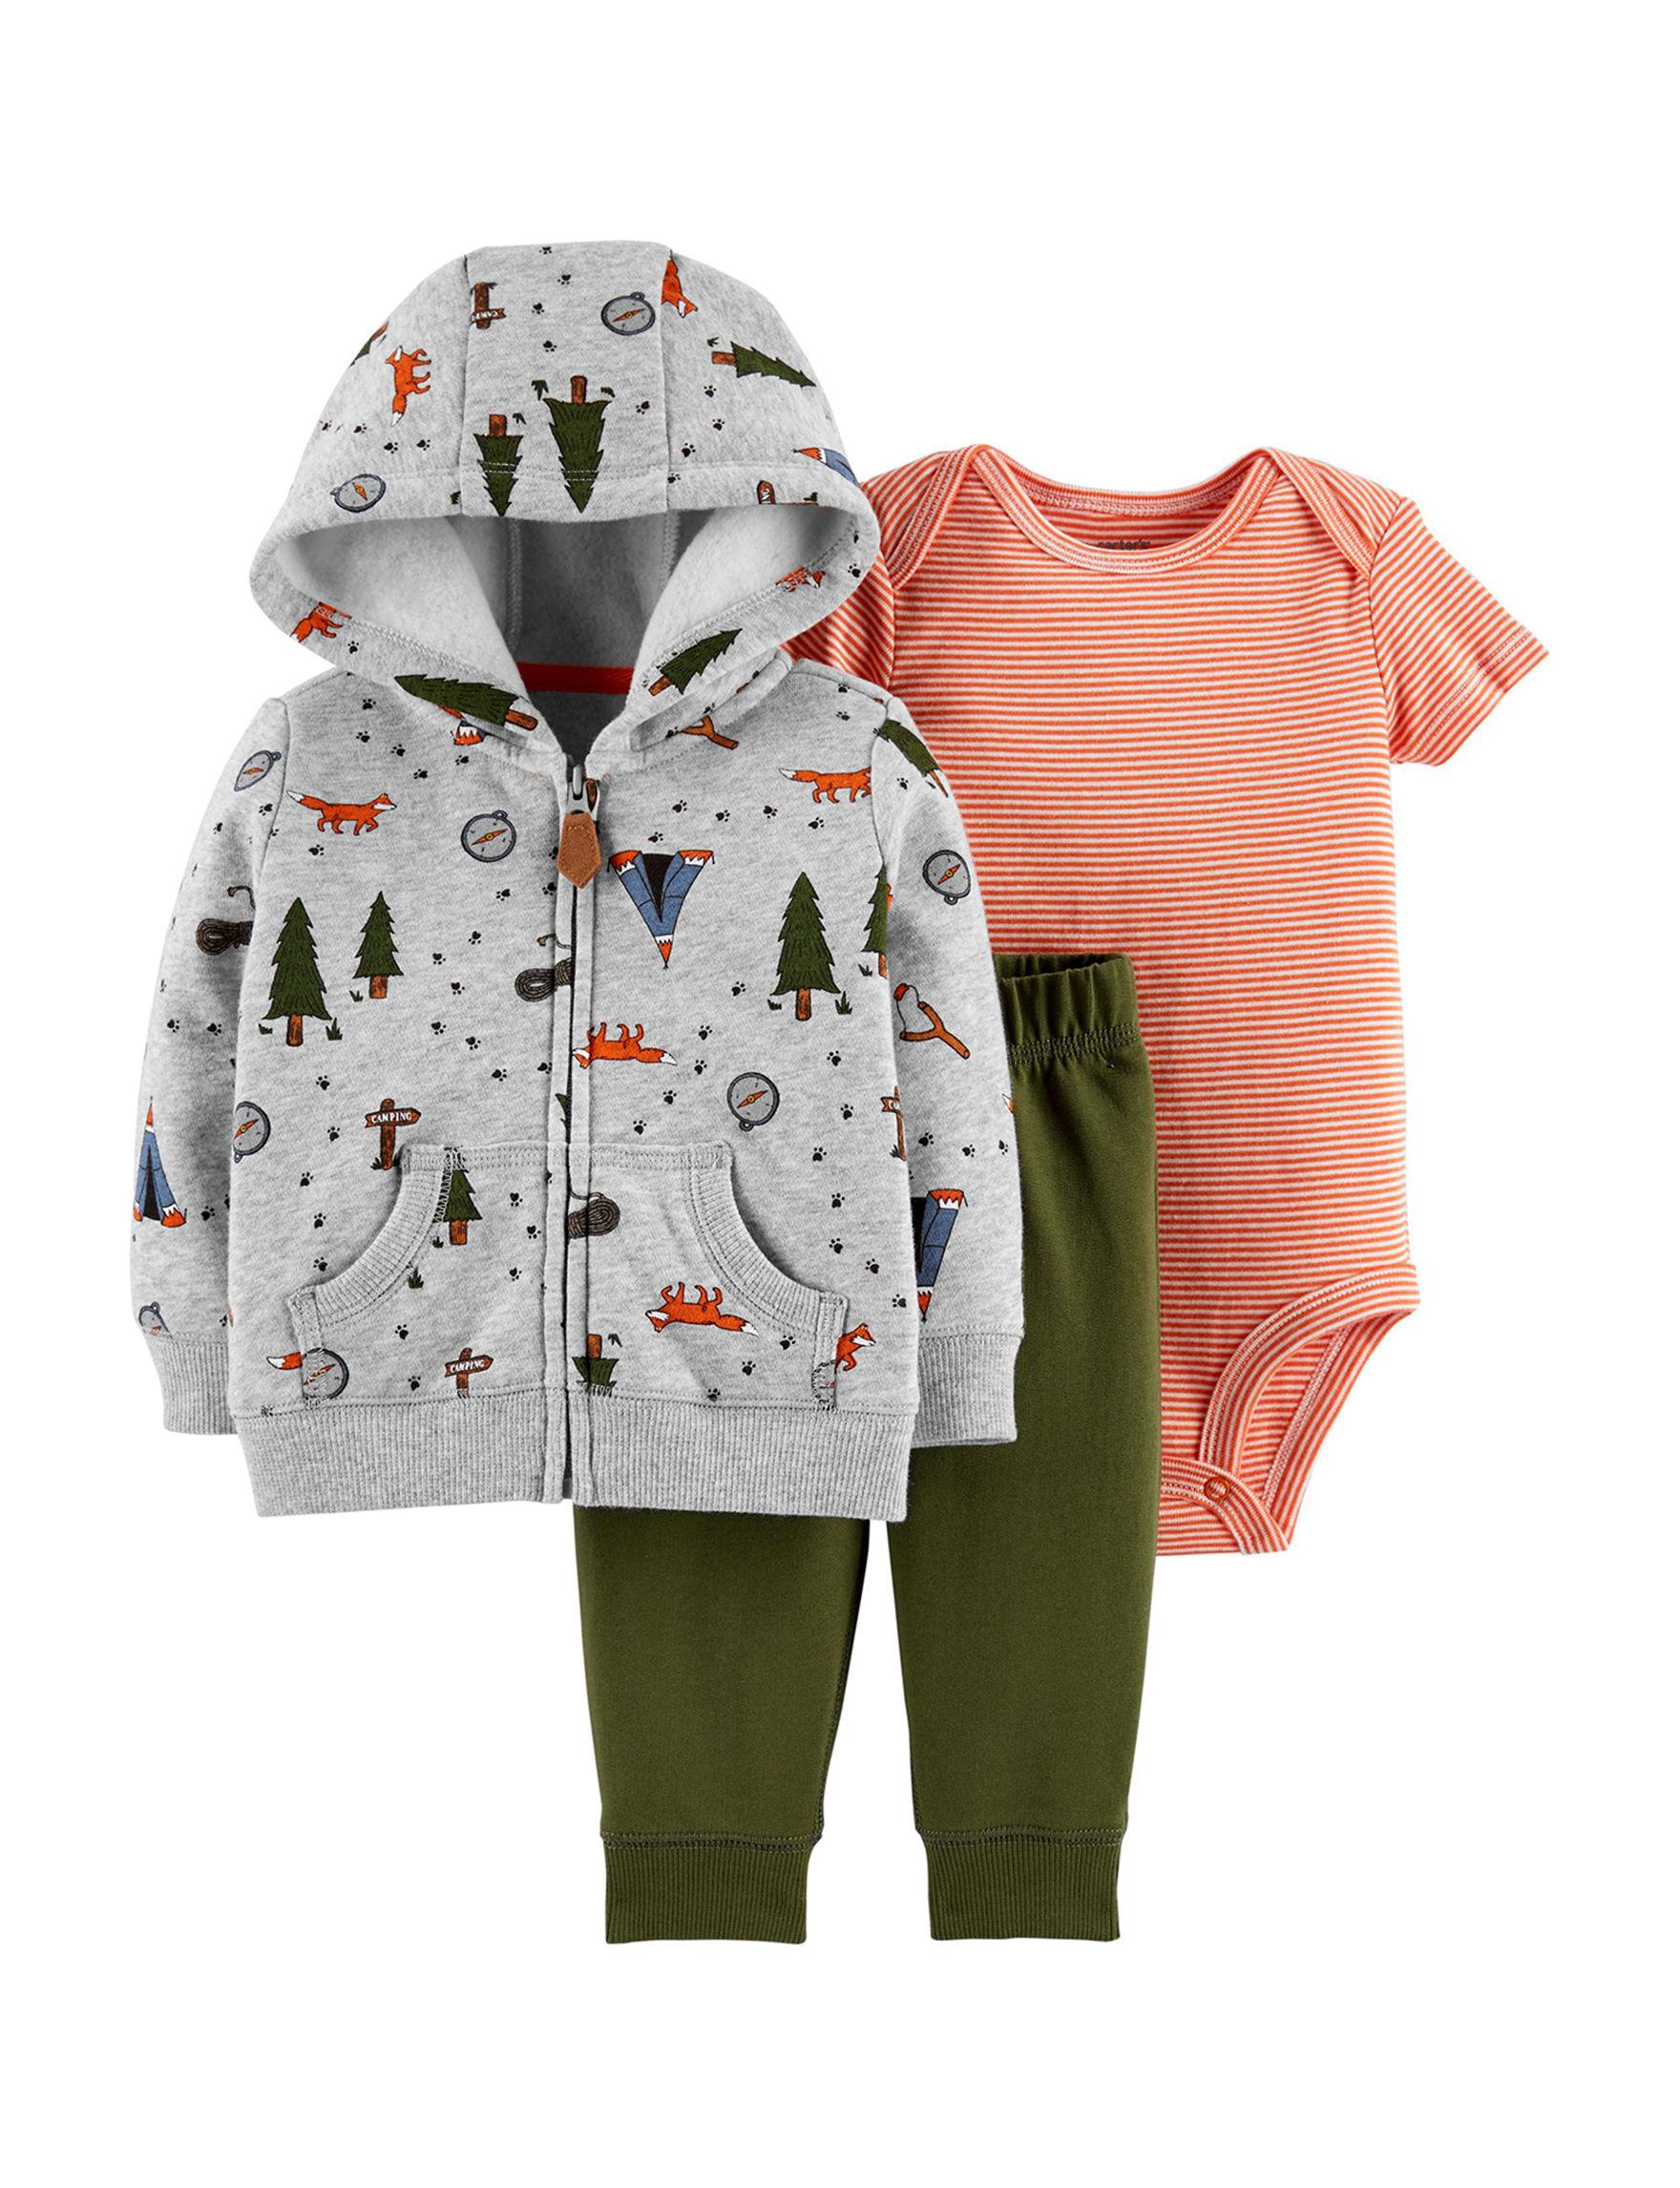 95cc4843a Carter's 3-pc. Camp Hooded Jacket, Bodysuit & Pants Set - Baby 3-18 Mos.